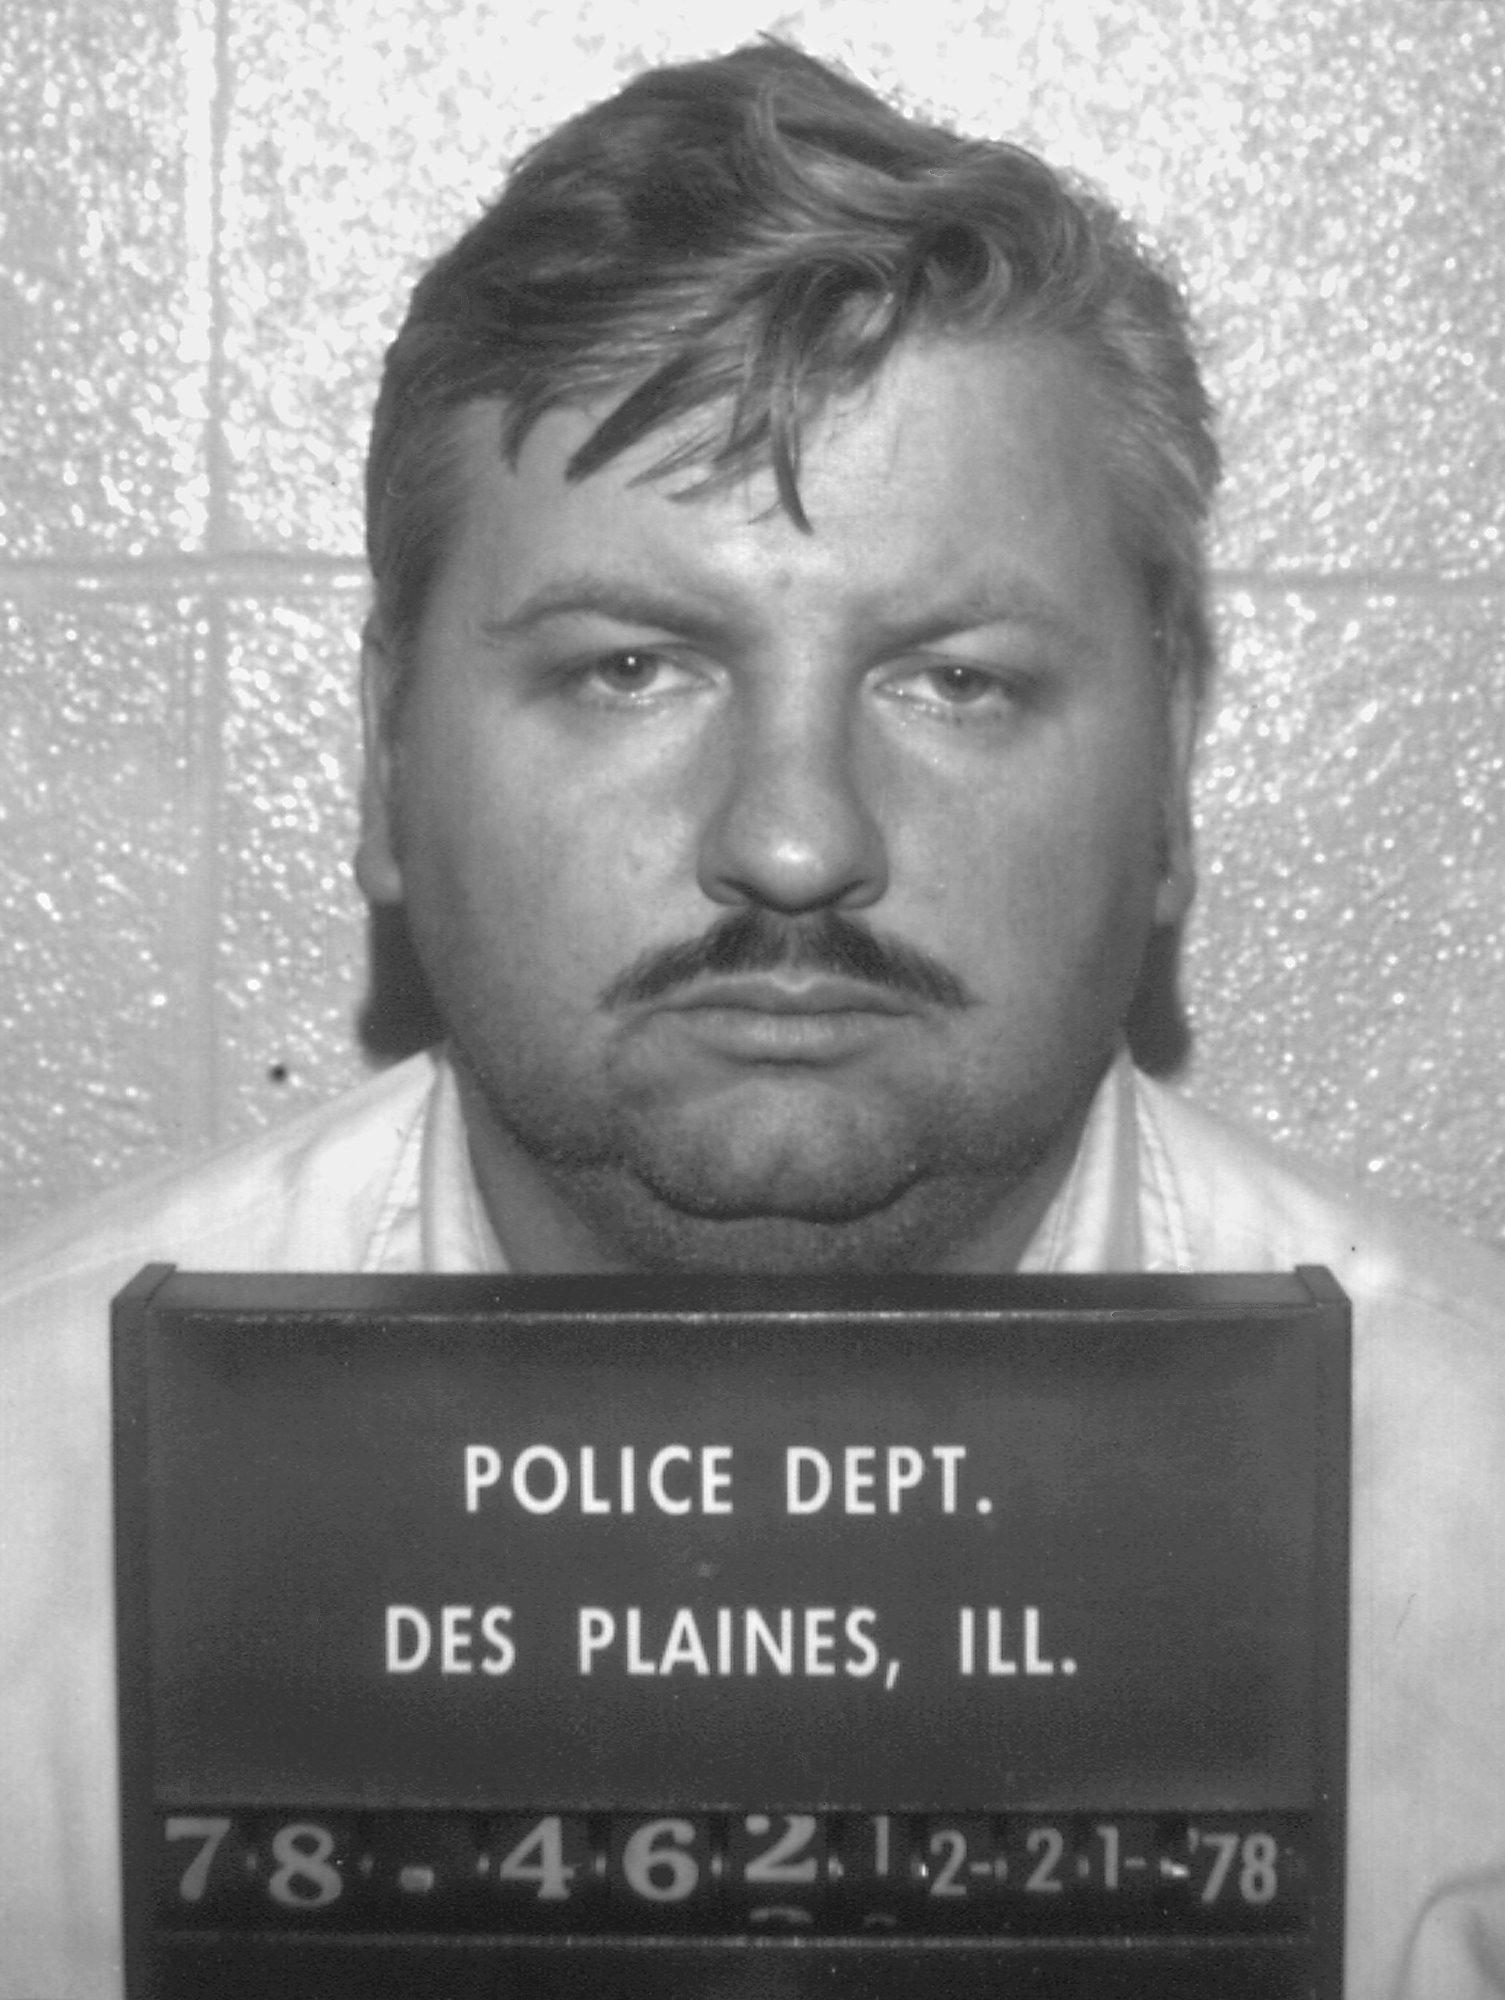 New victim of serial killer John Wayne Gacy identified as